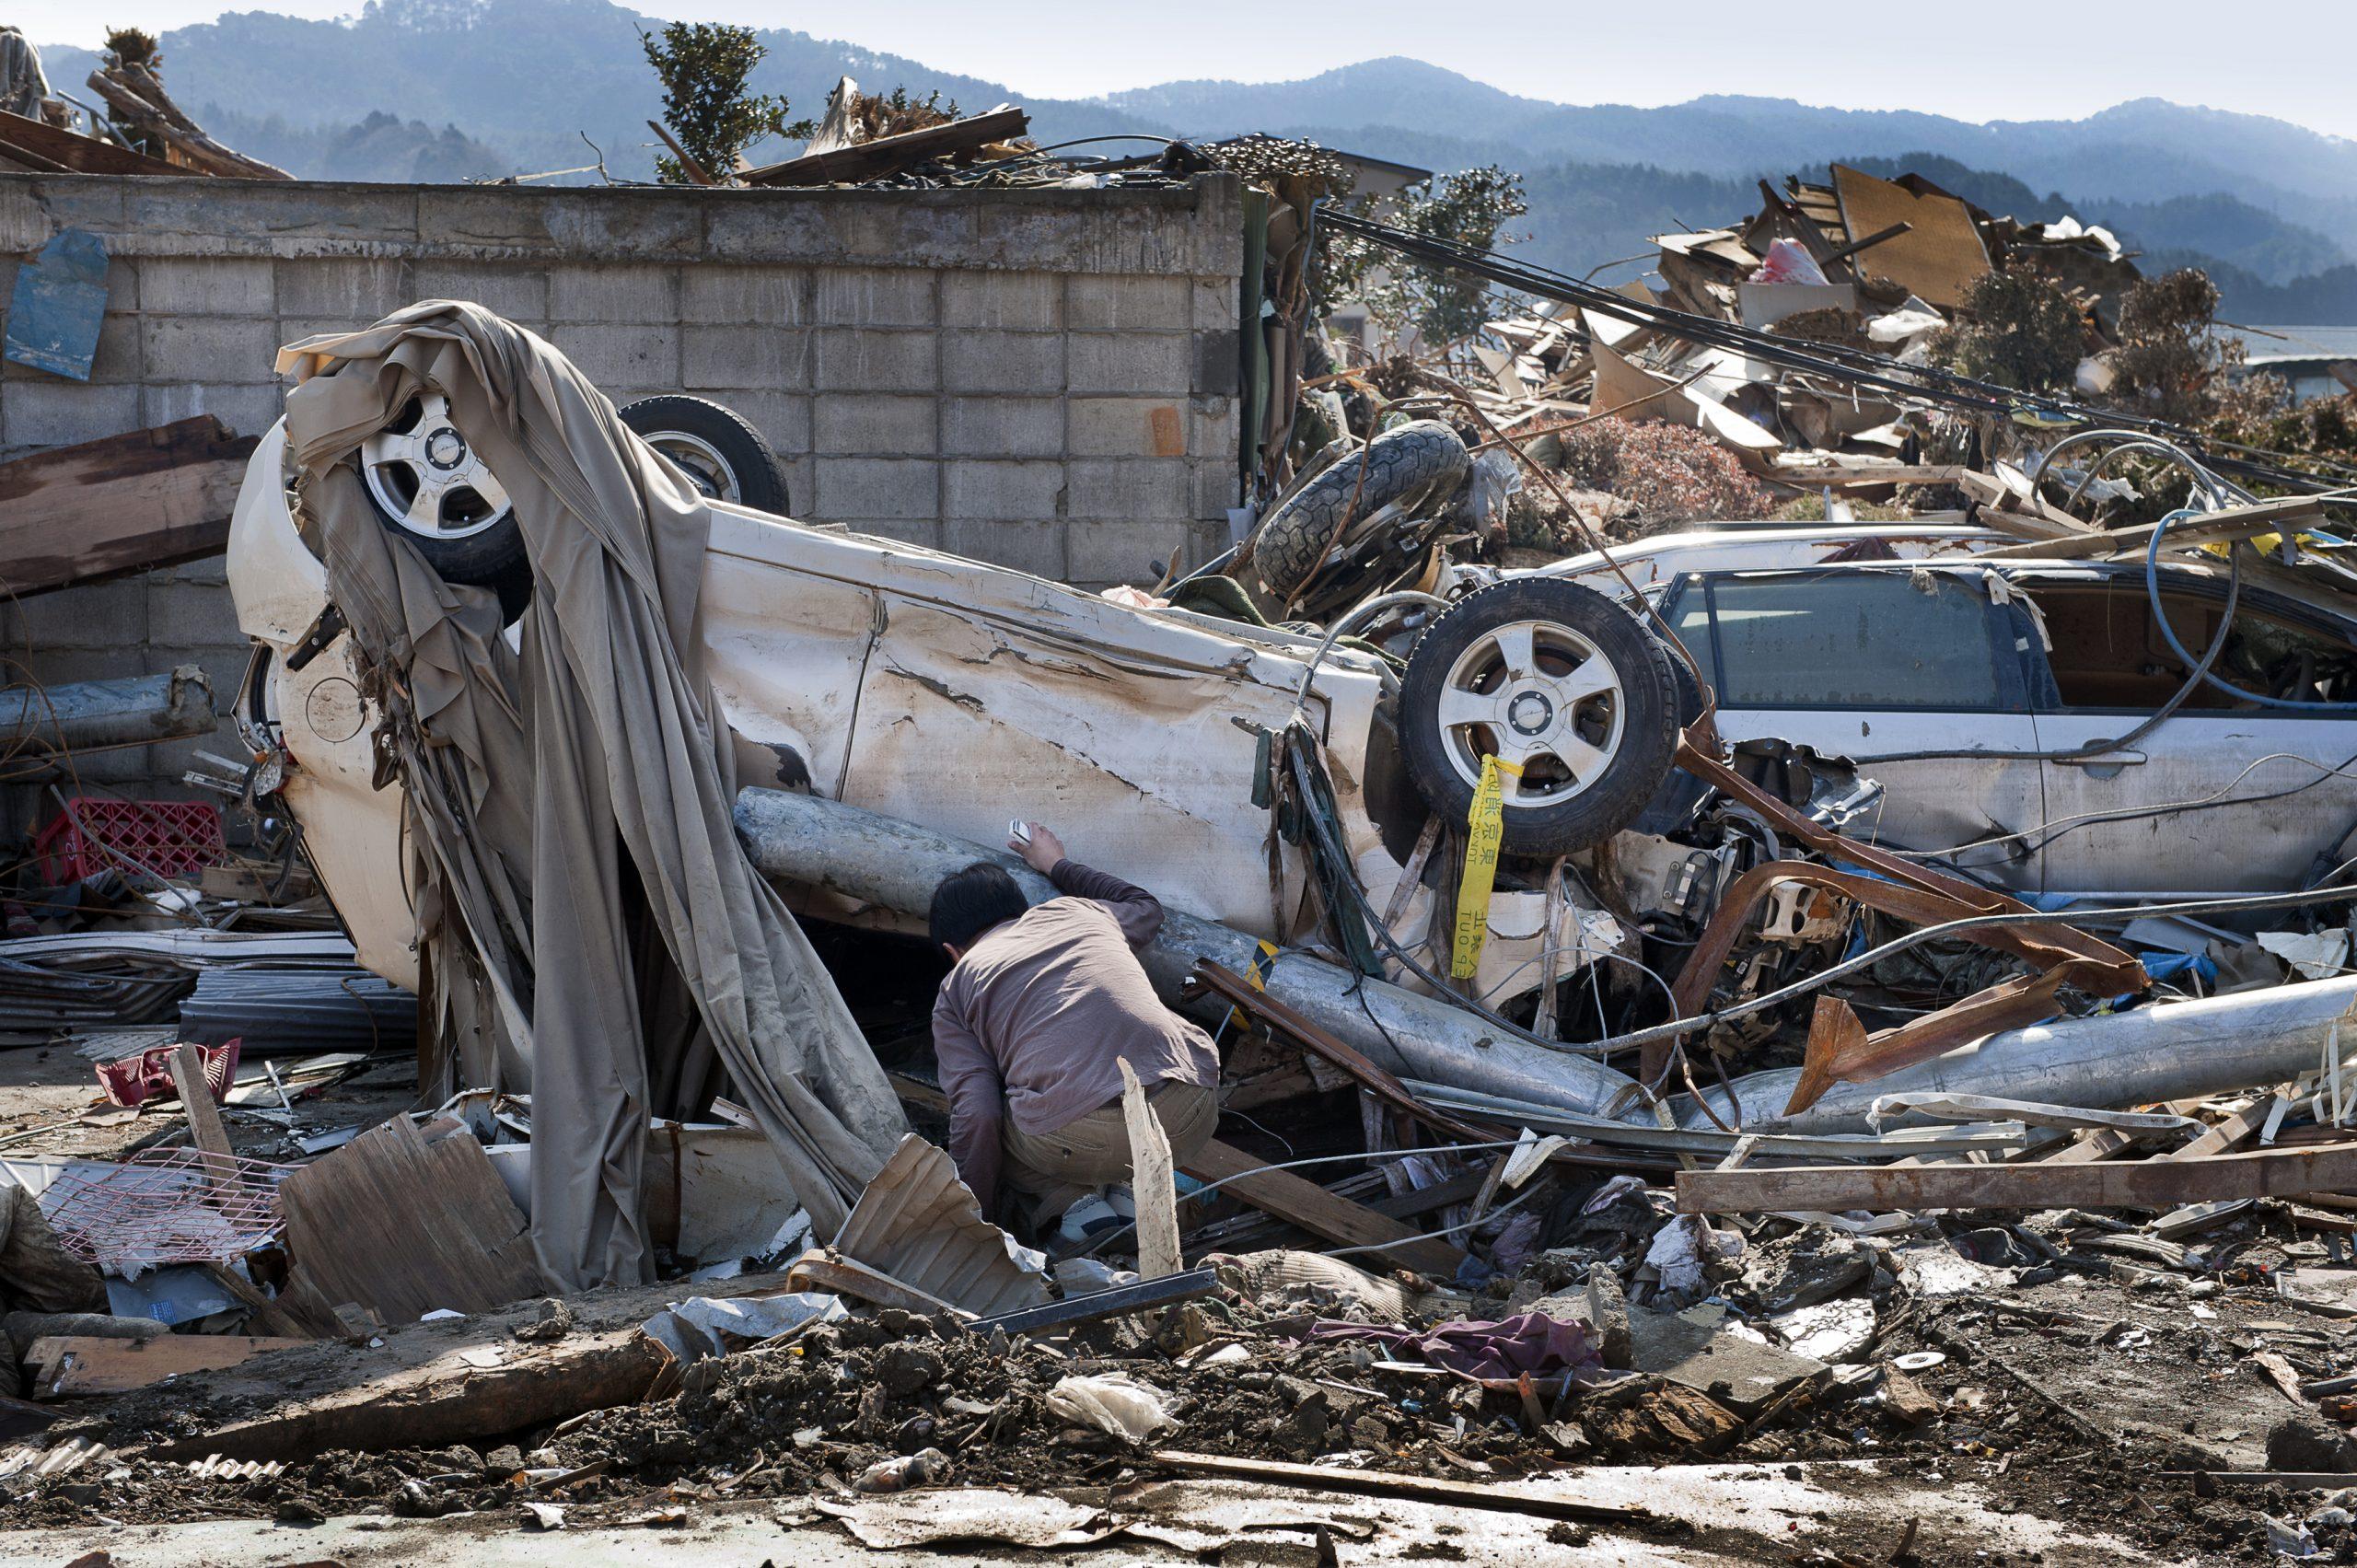 <p>A man searches through the rubble in Rikuzentakata in the wake of the tsunami.</p>